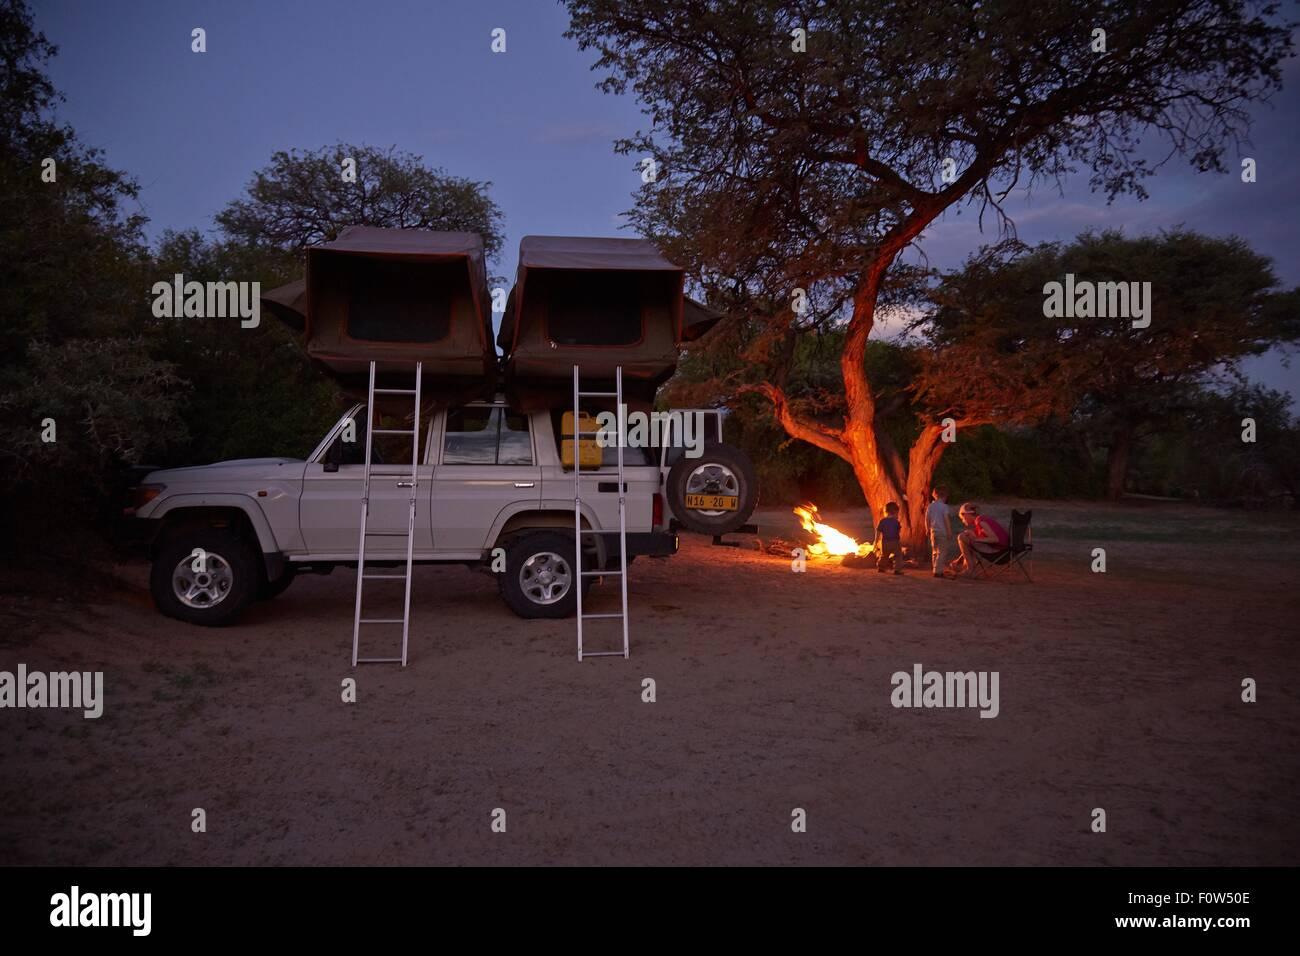 Off road vehicle parked, family sitting around campfire, Purros, Kaokoland, Namibia - Stock Image